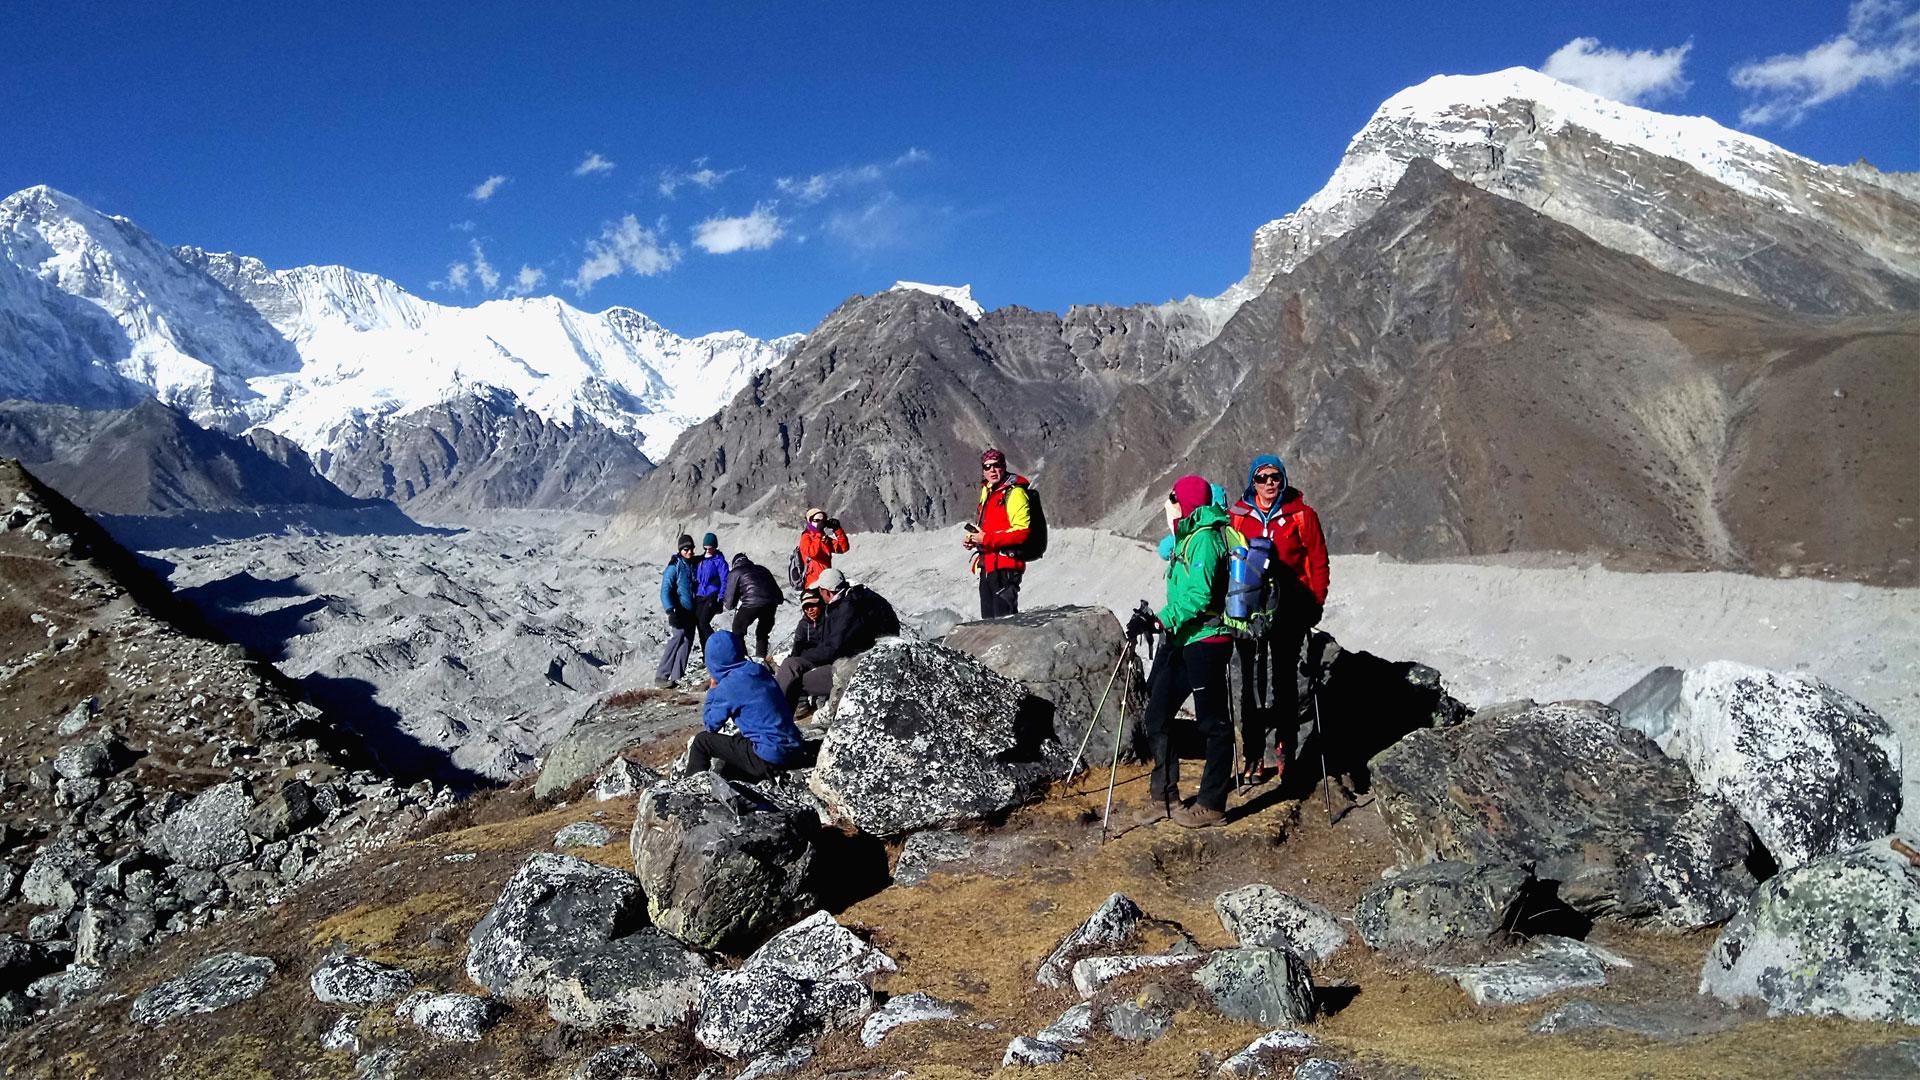 Trekking in the Himalayas